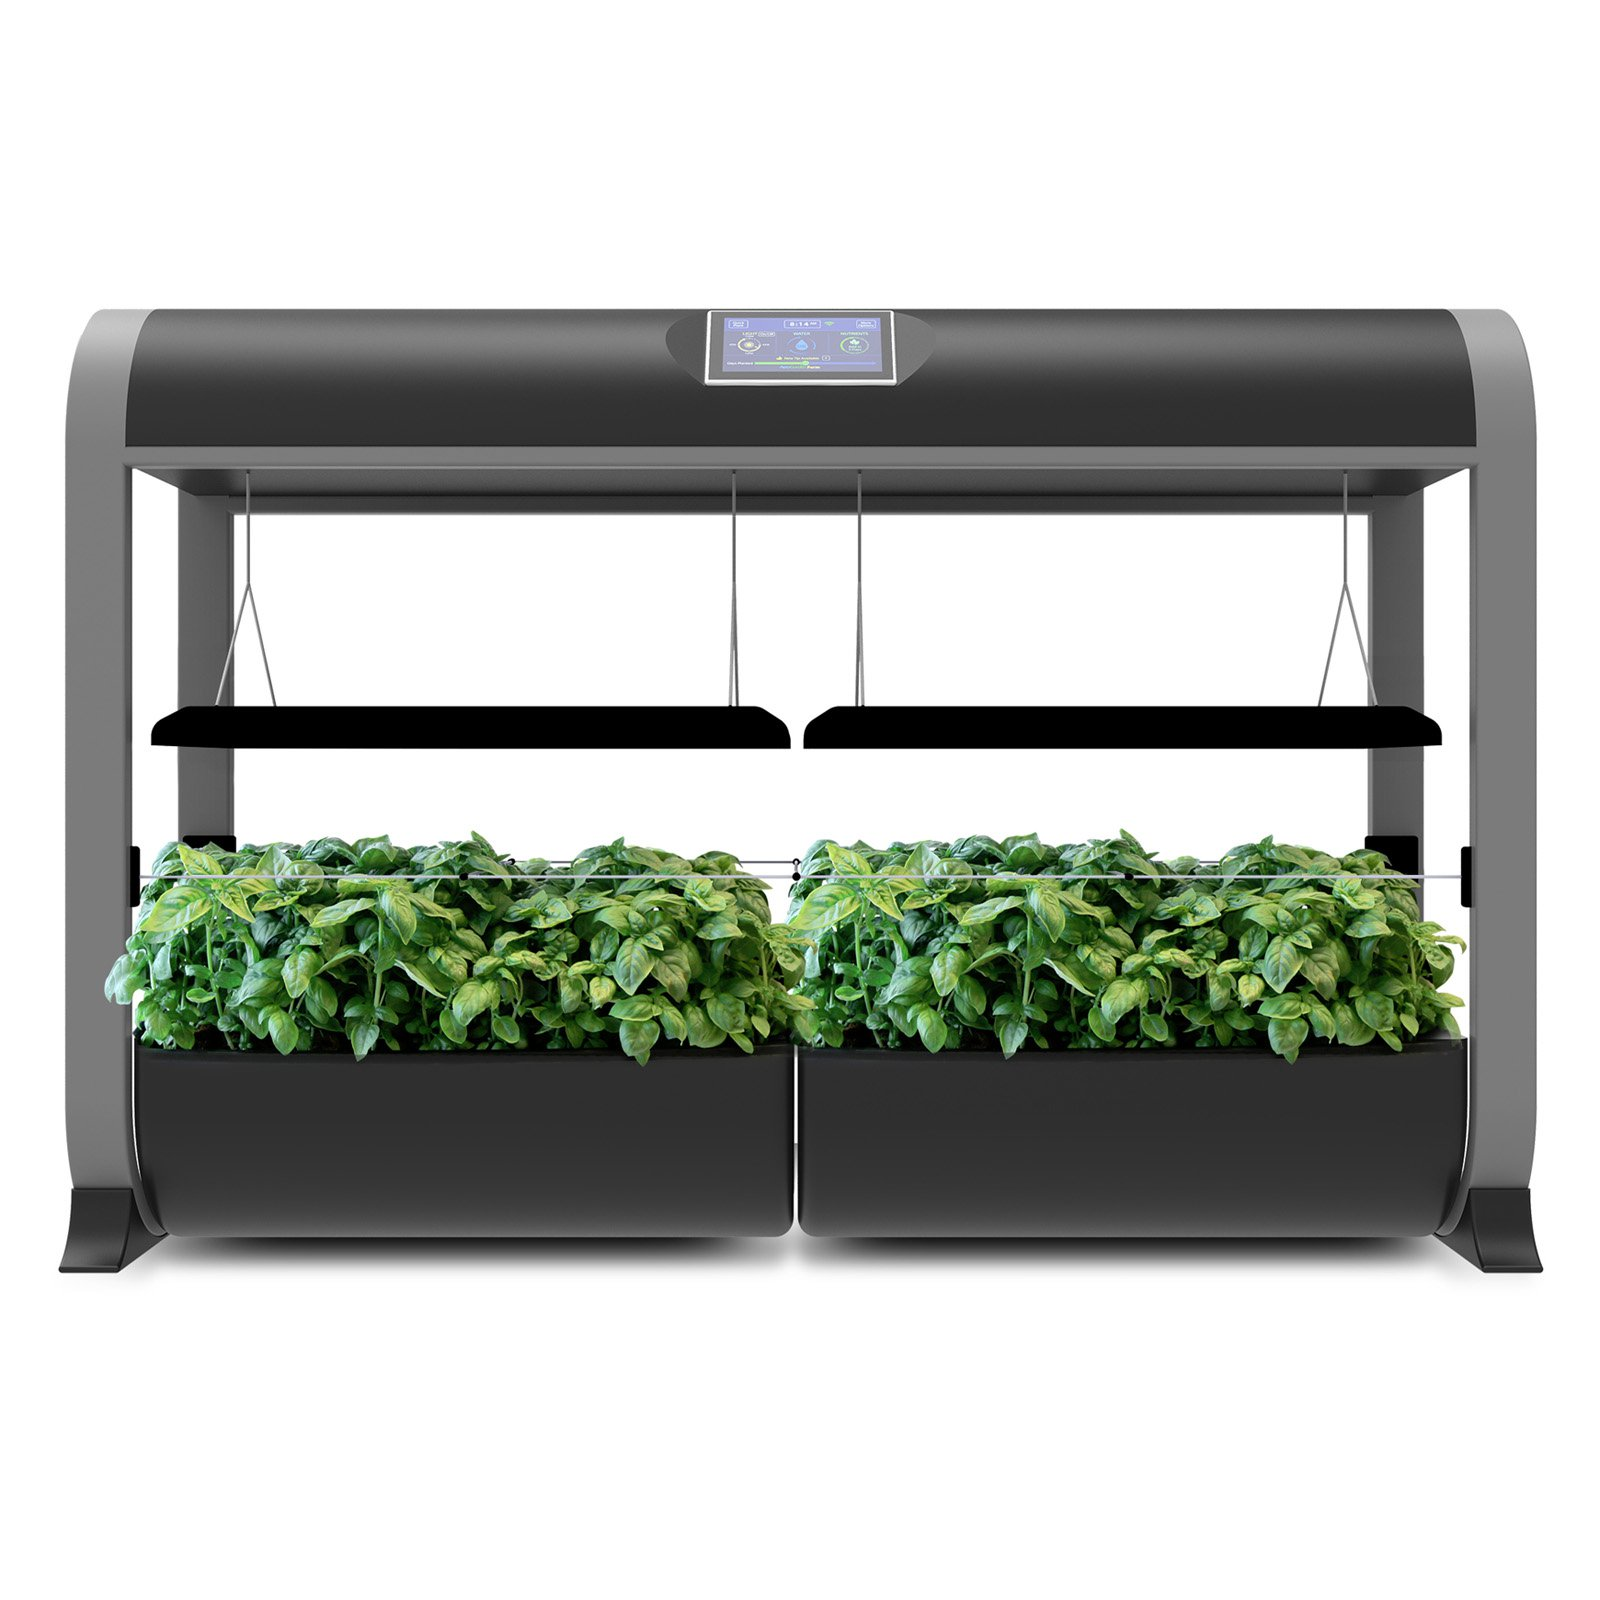 Aerogarden Farm In Home Digital Water Gardening System 400 x 300